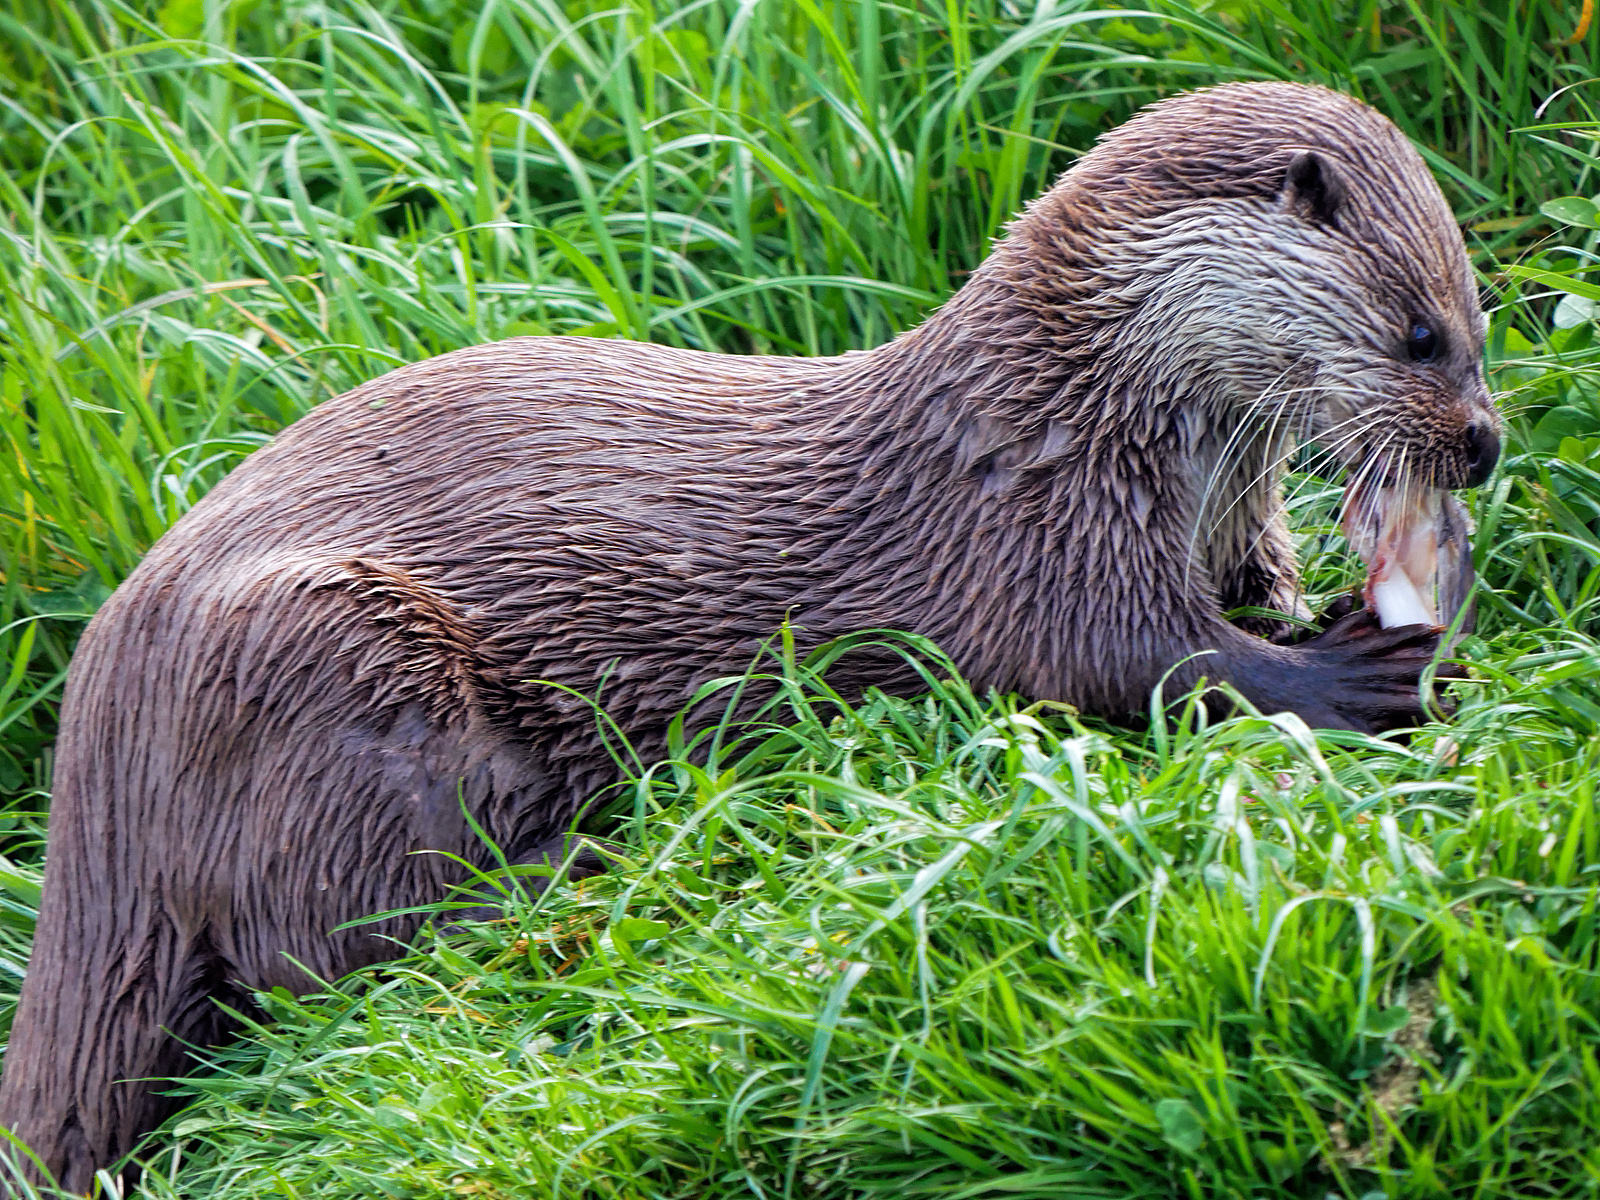 European Otter (Lutra lutra) feeding